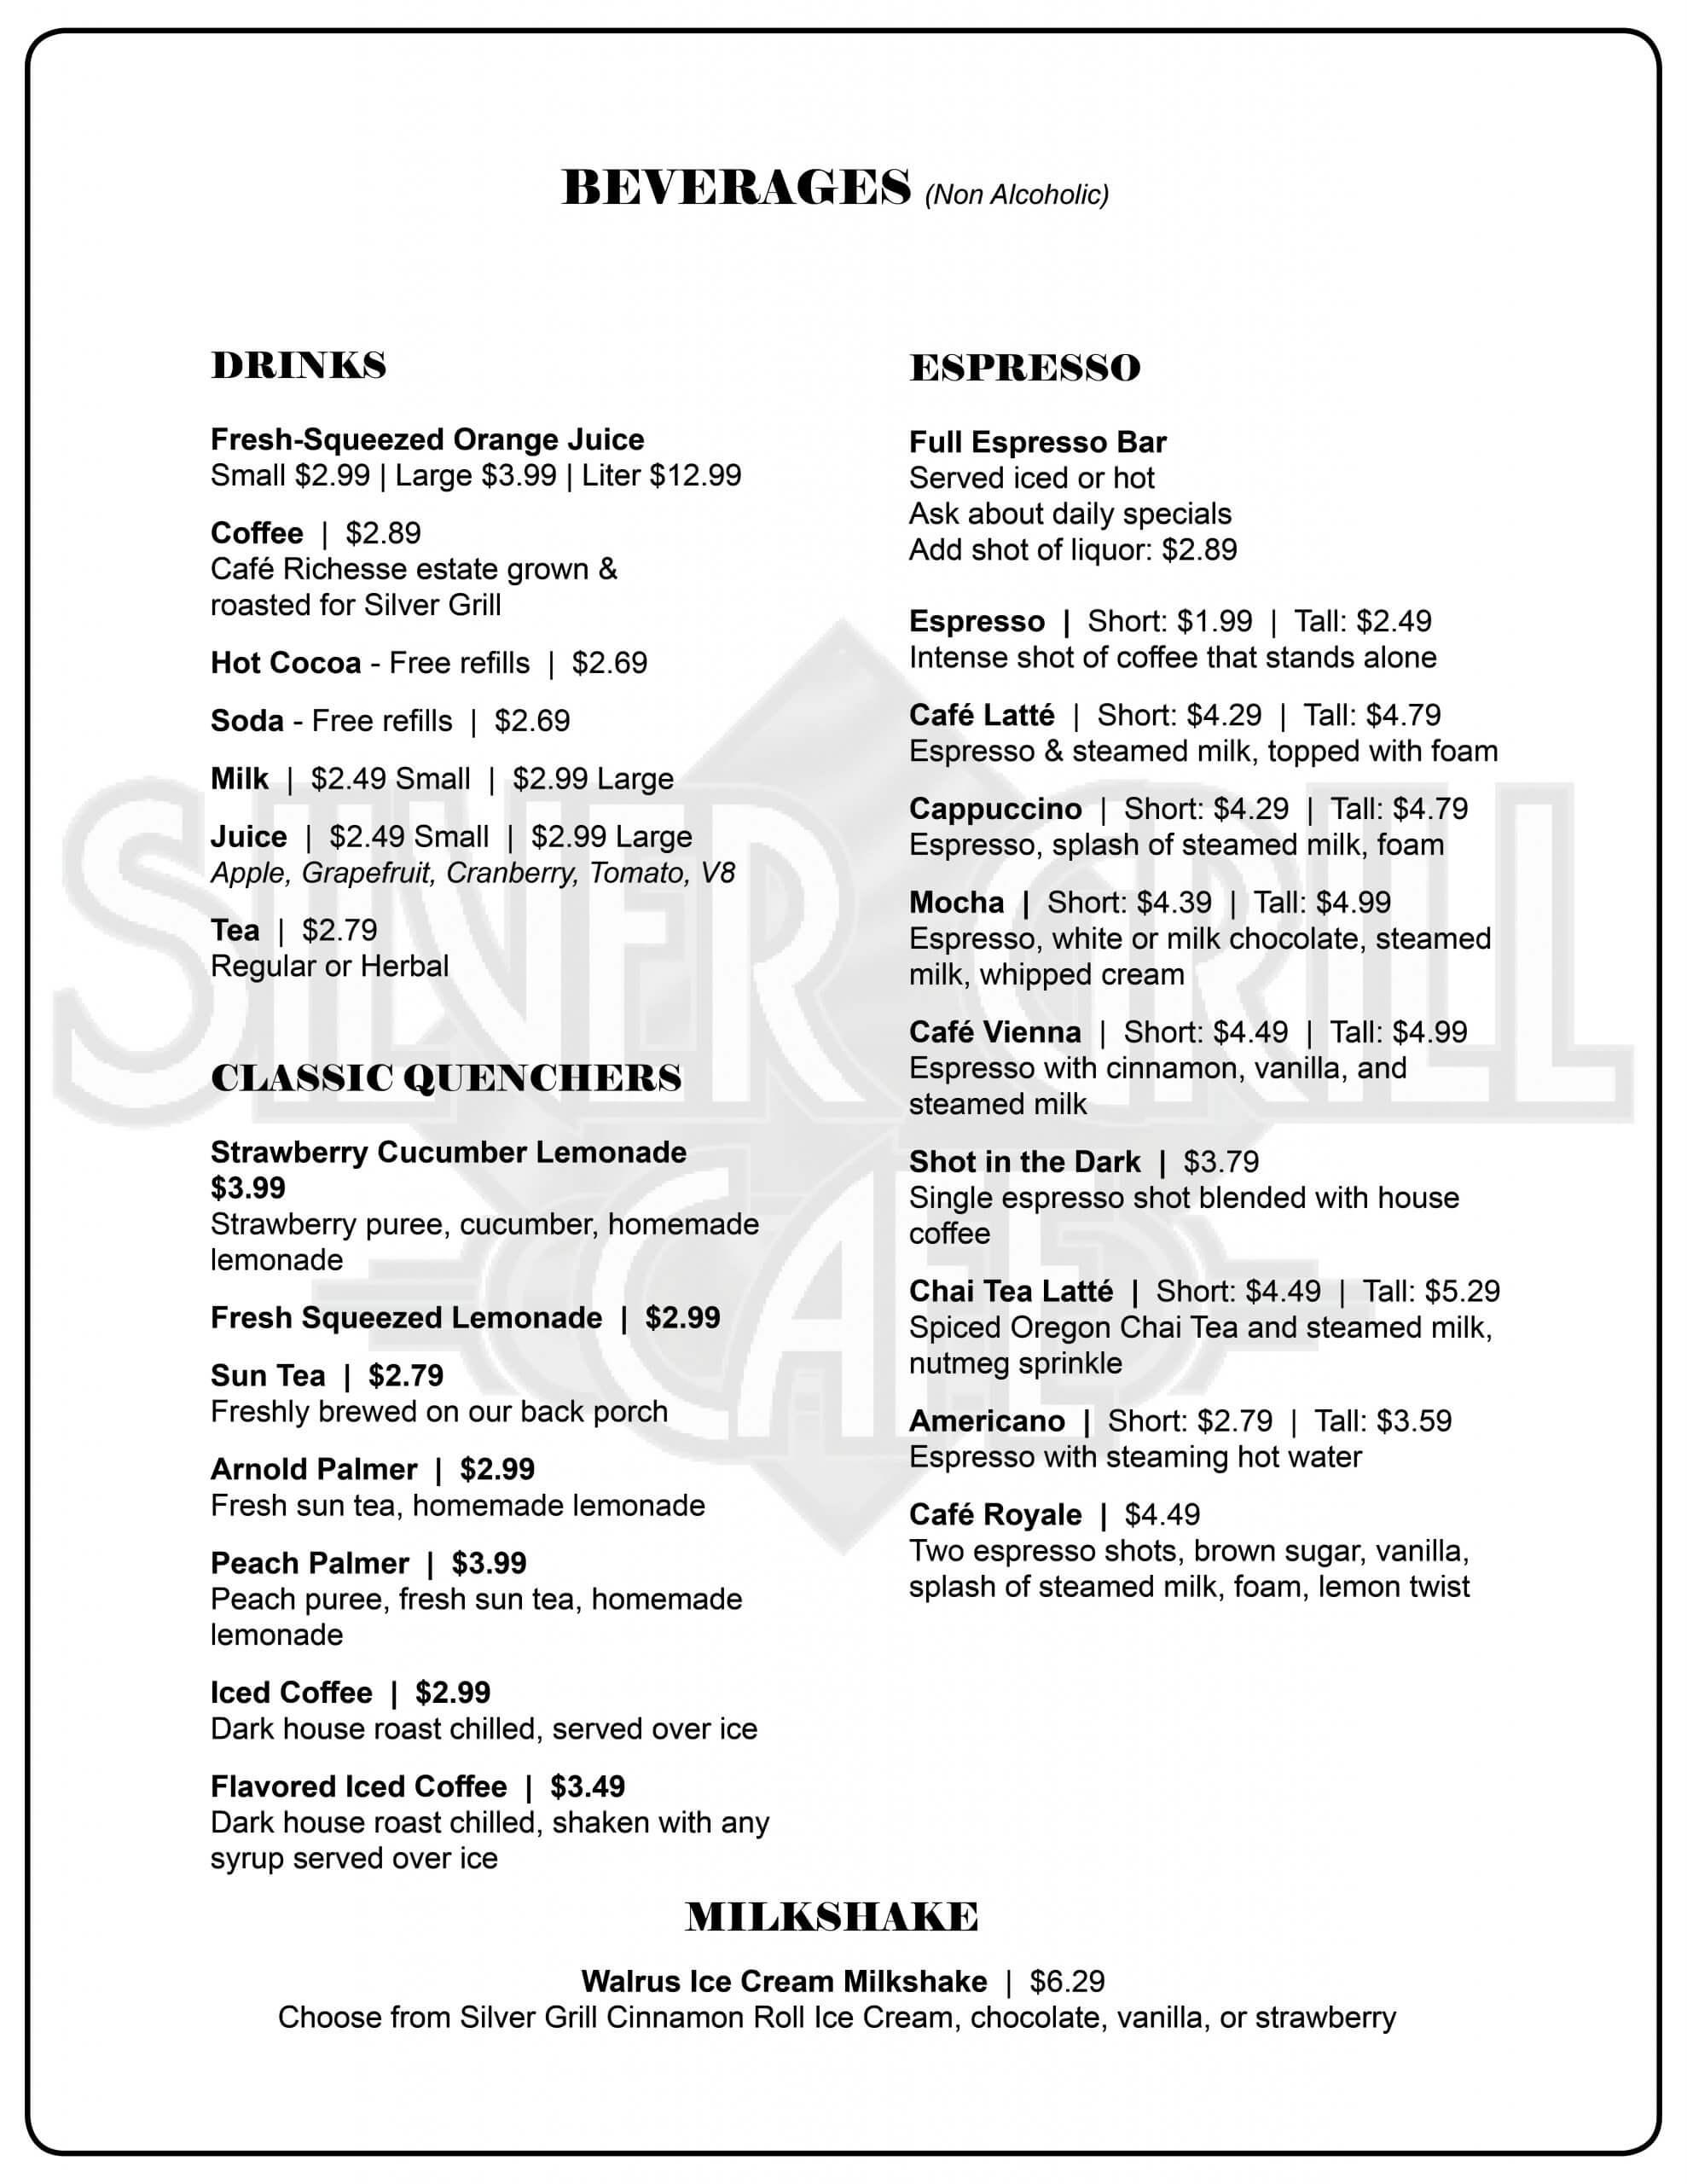 Silver Grill 8.5x11 2 sided FULL MENU Social Media Page 3